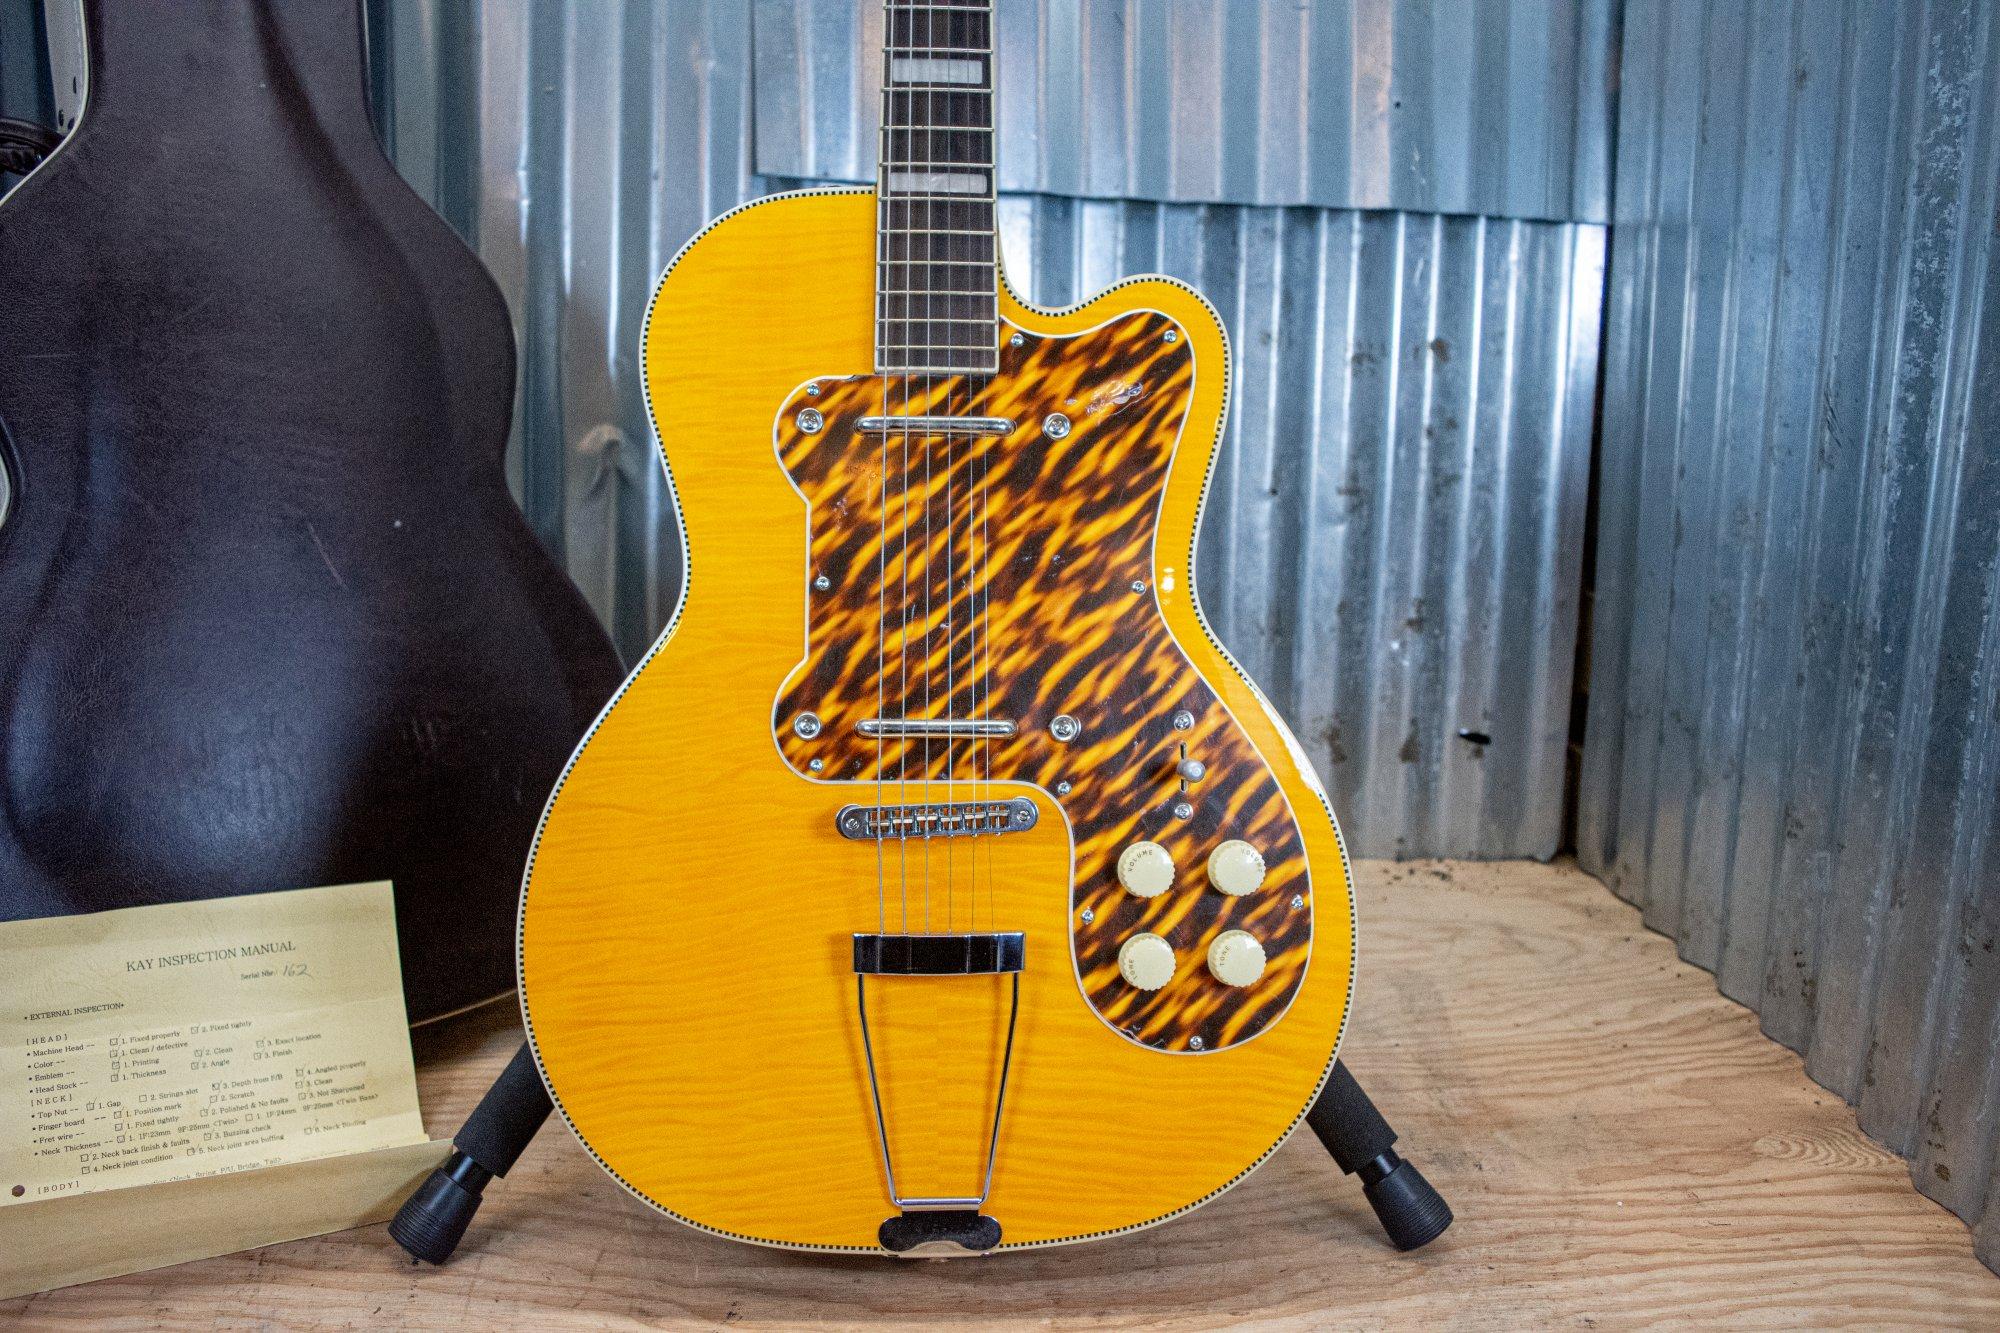 Kay K161V Thin Twin Electric Guitar Vintage Reissue-Artist Blonde WOHSC